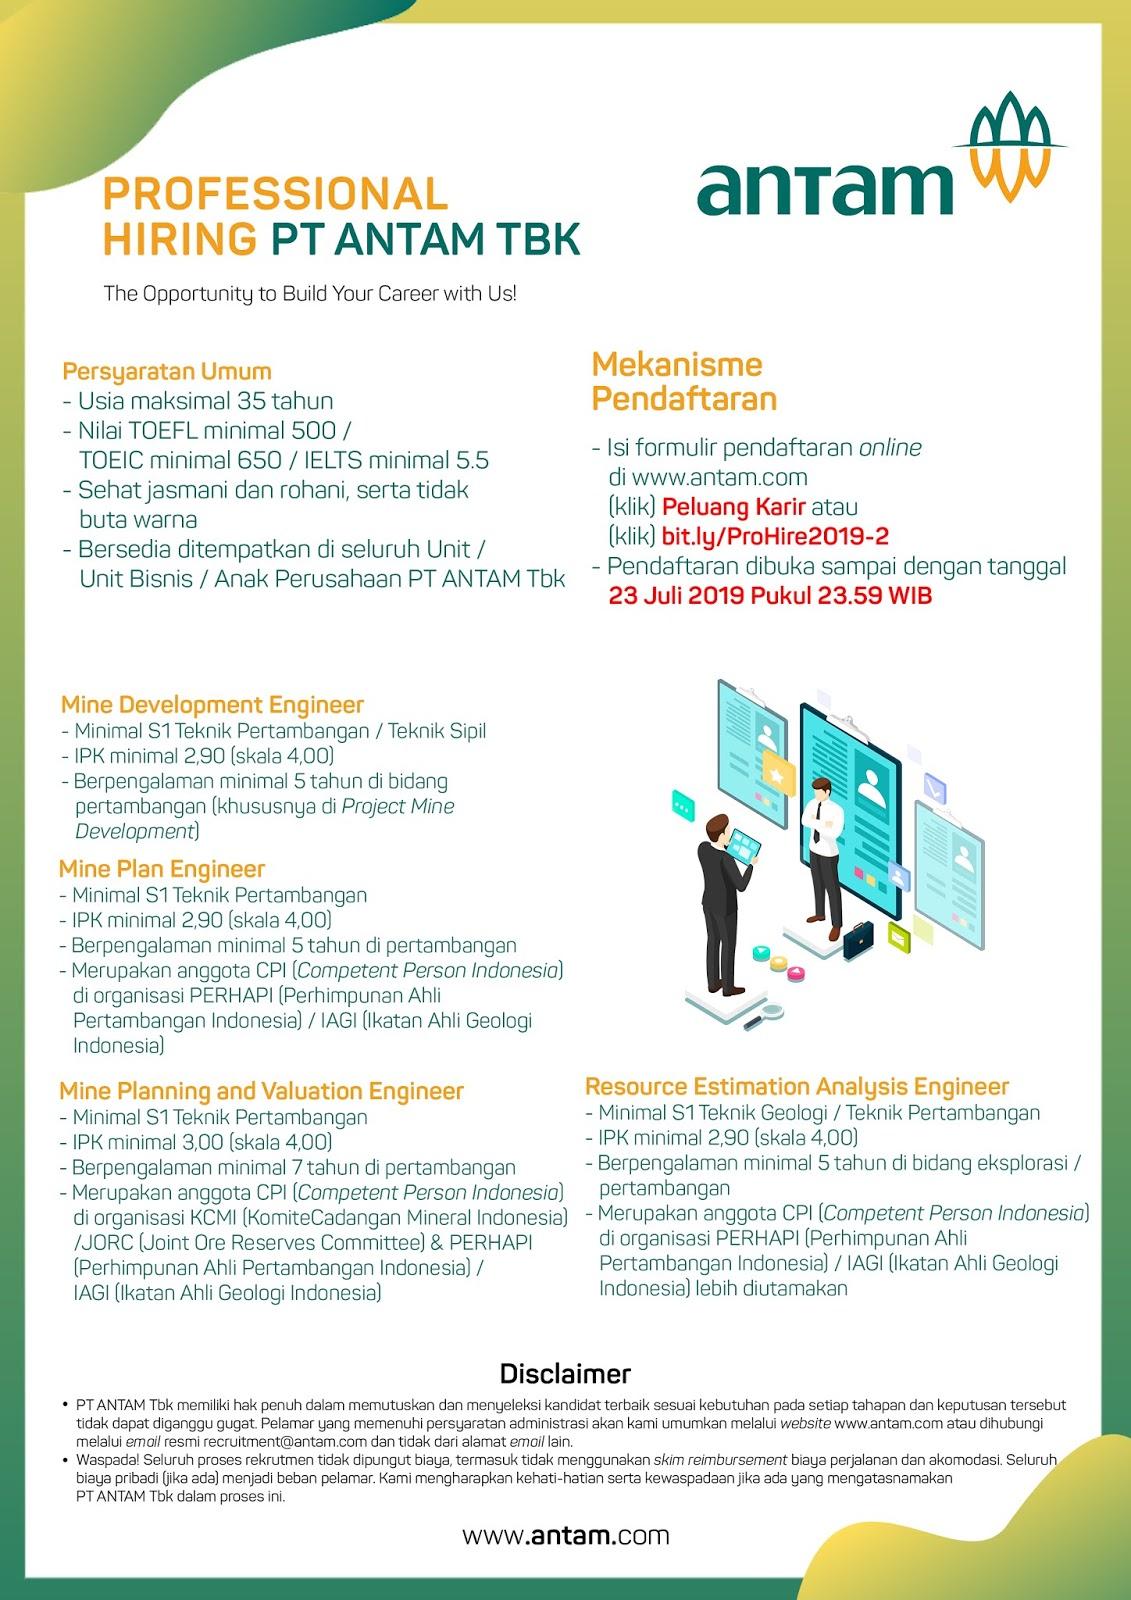 Lowongan Kerja Bumn Medan Juli 2019 Di Pt Antam Persero Lowongan Kerja Medan Terbaru Tahun 2021